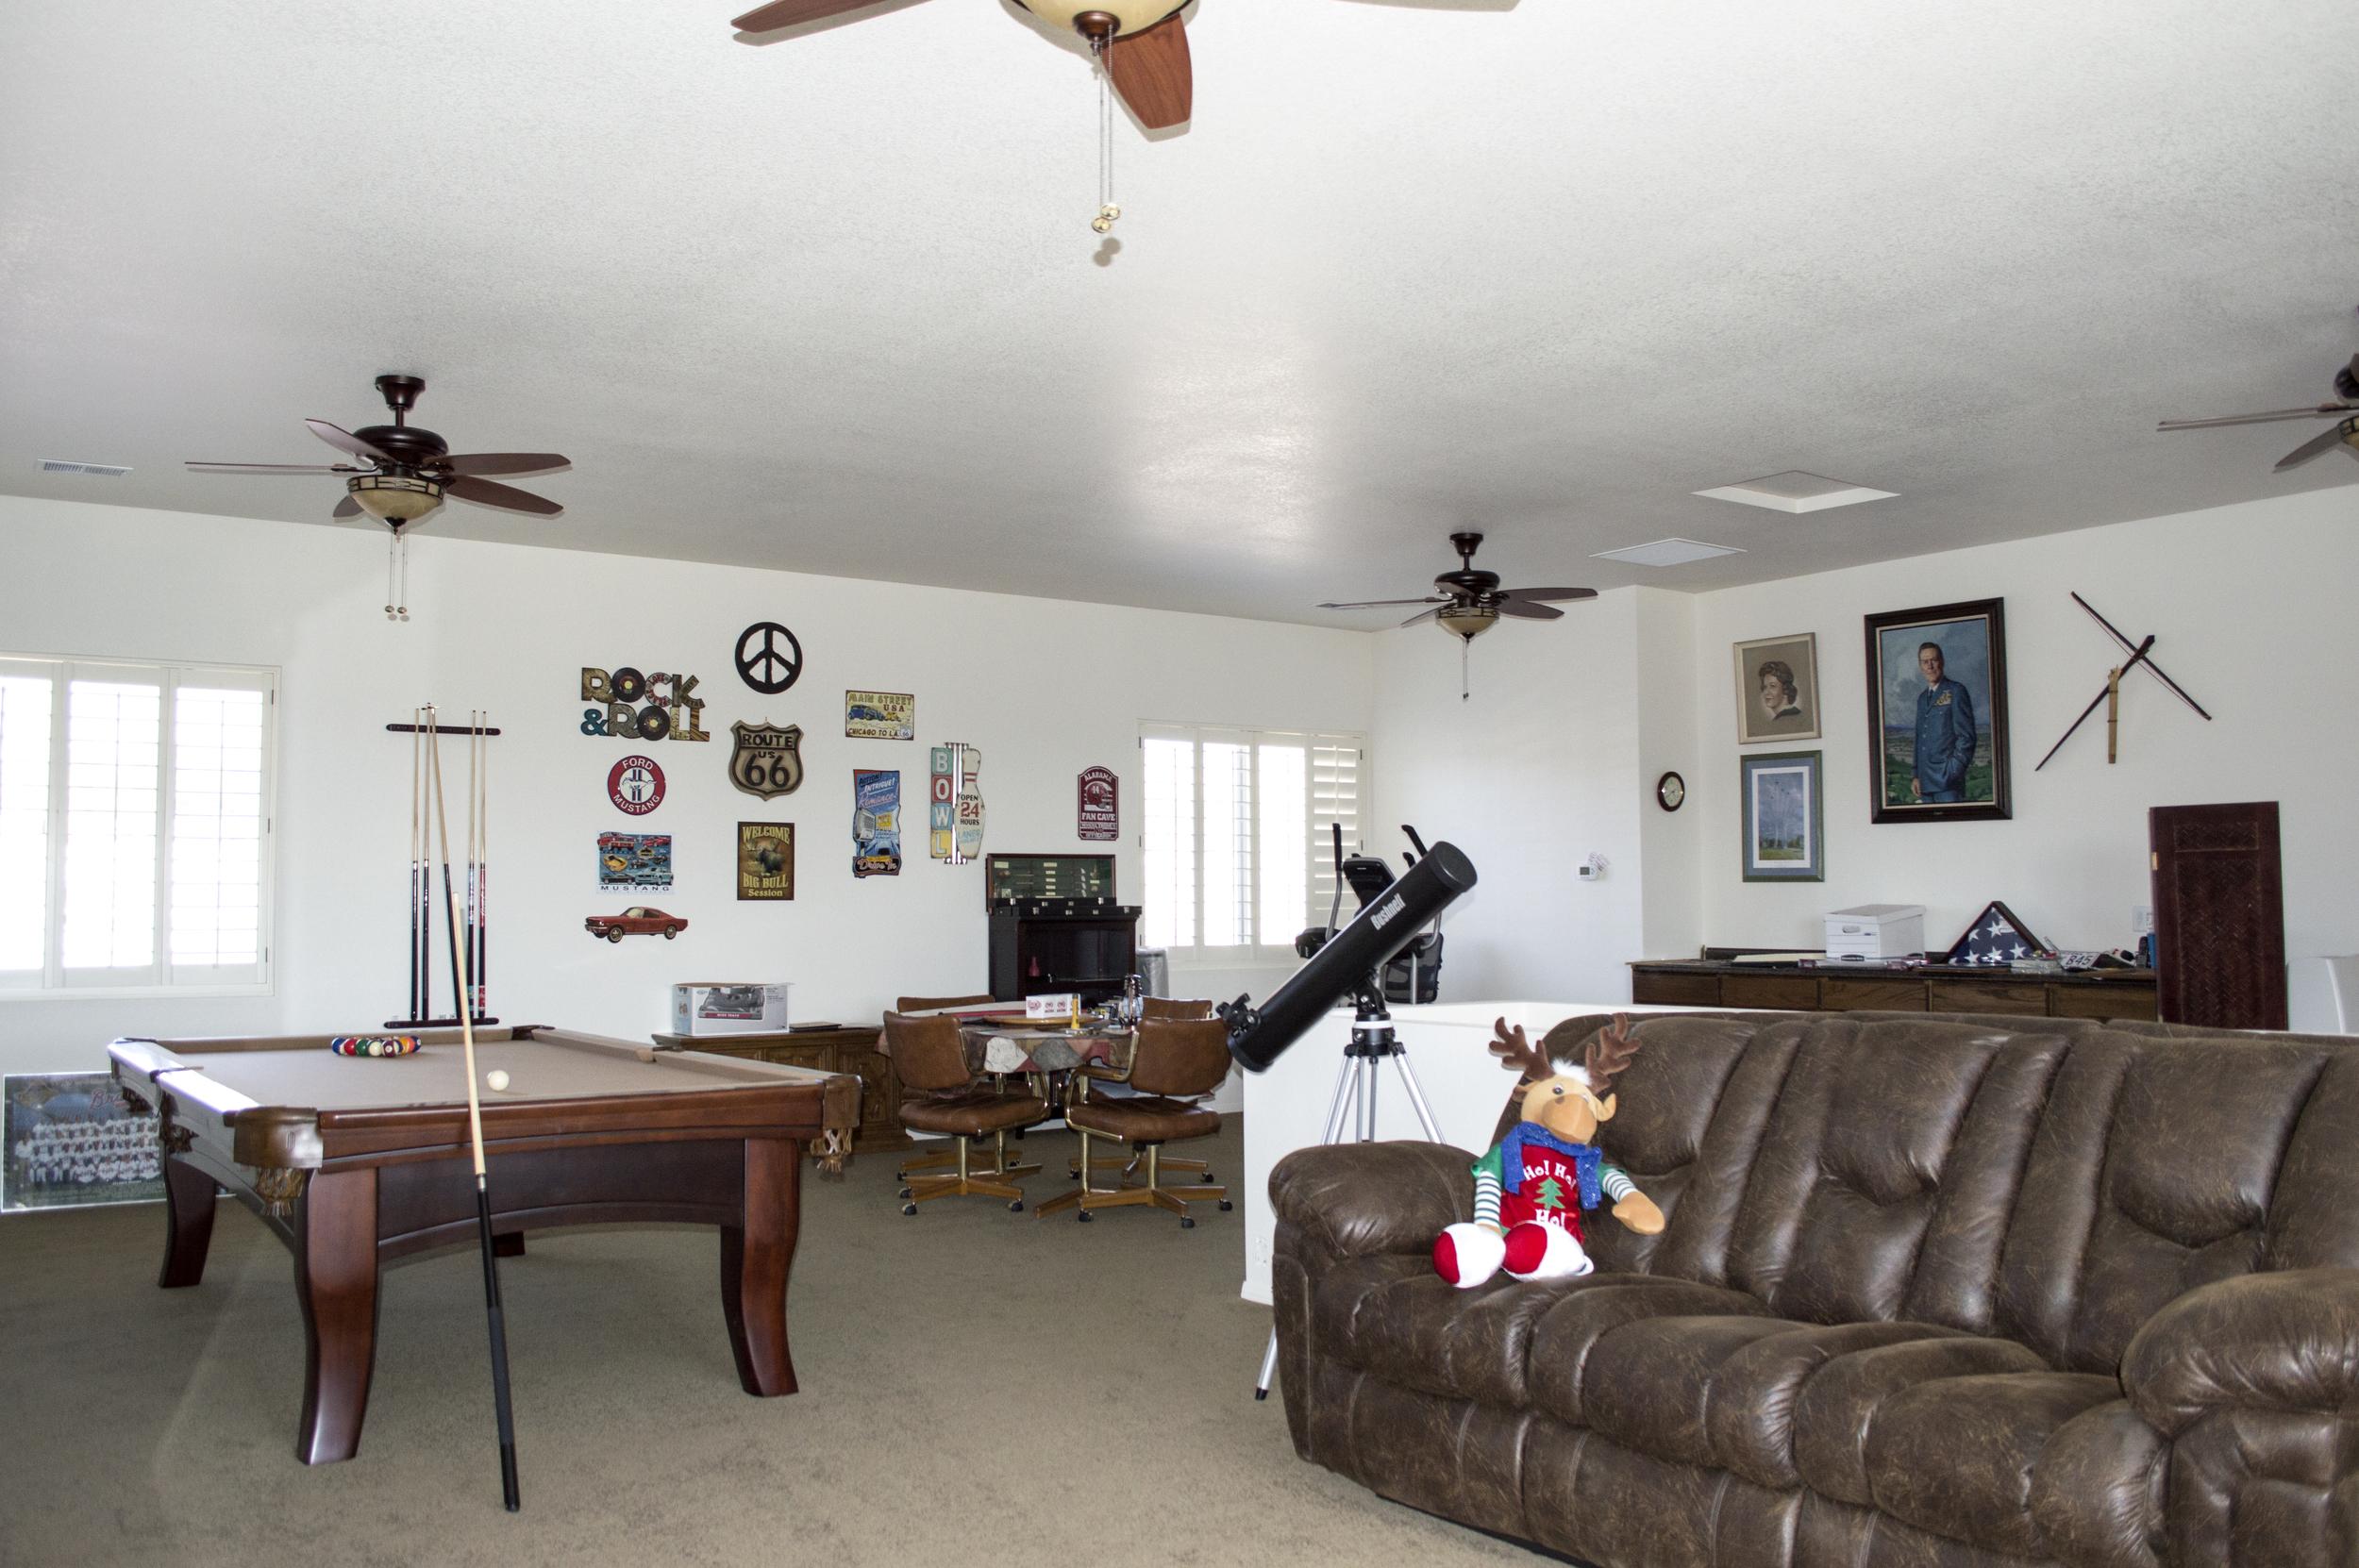 Living room of a residential custom home near Flagstaff, Arizona.